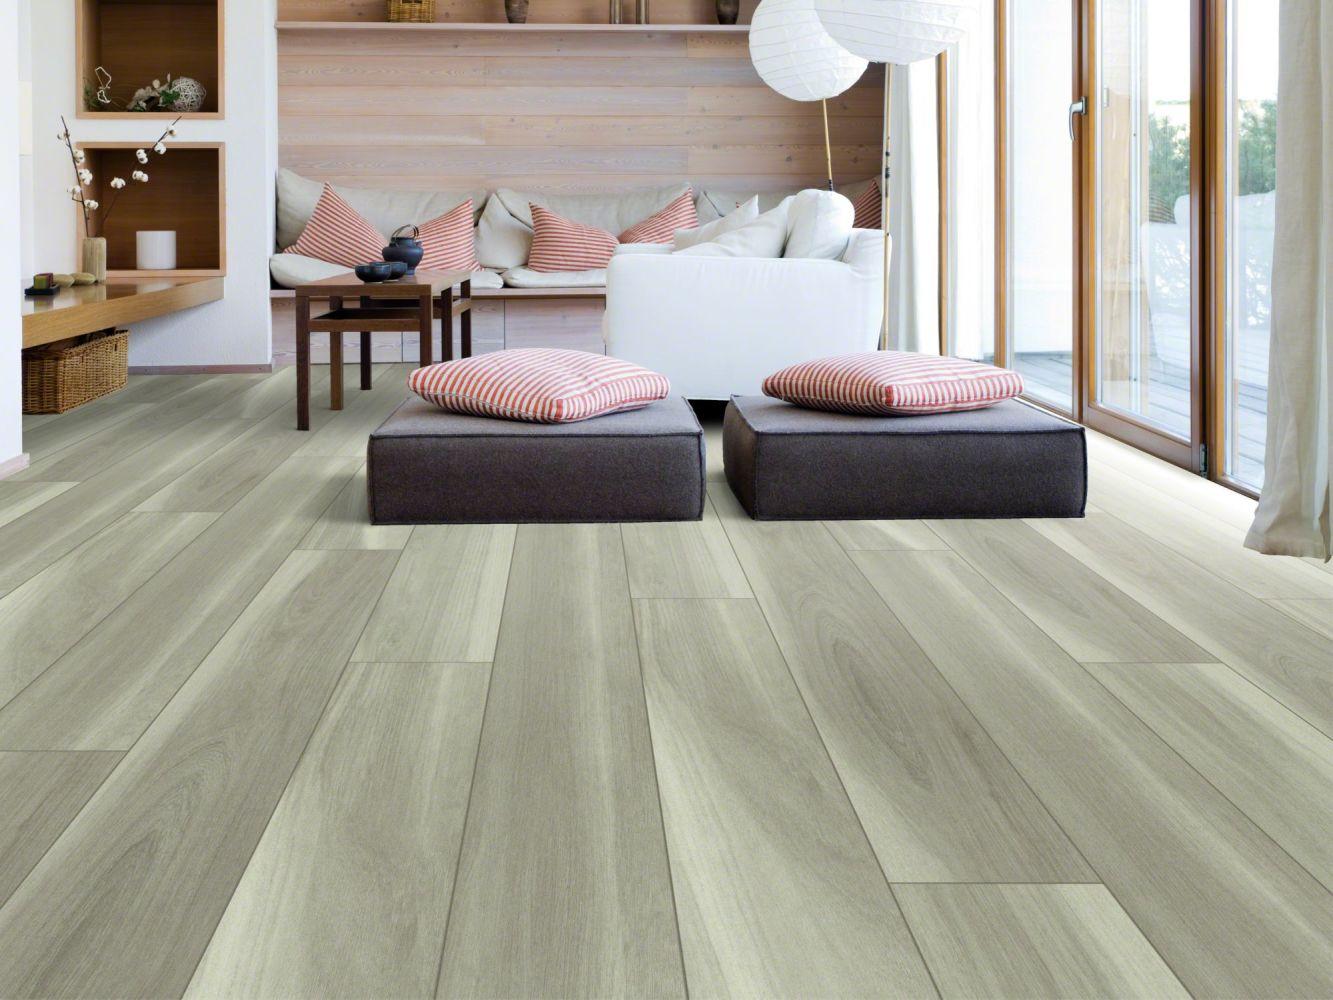 Shaw Floors Nfa HS Beaver Creek Misty Oak 05008_VH544